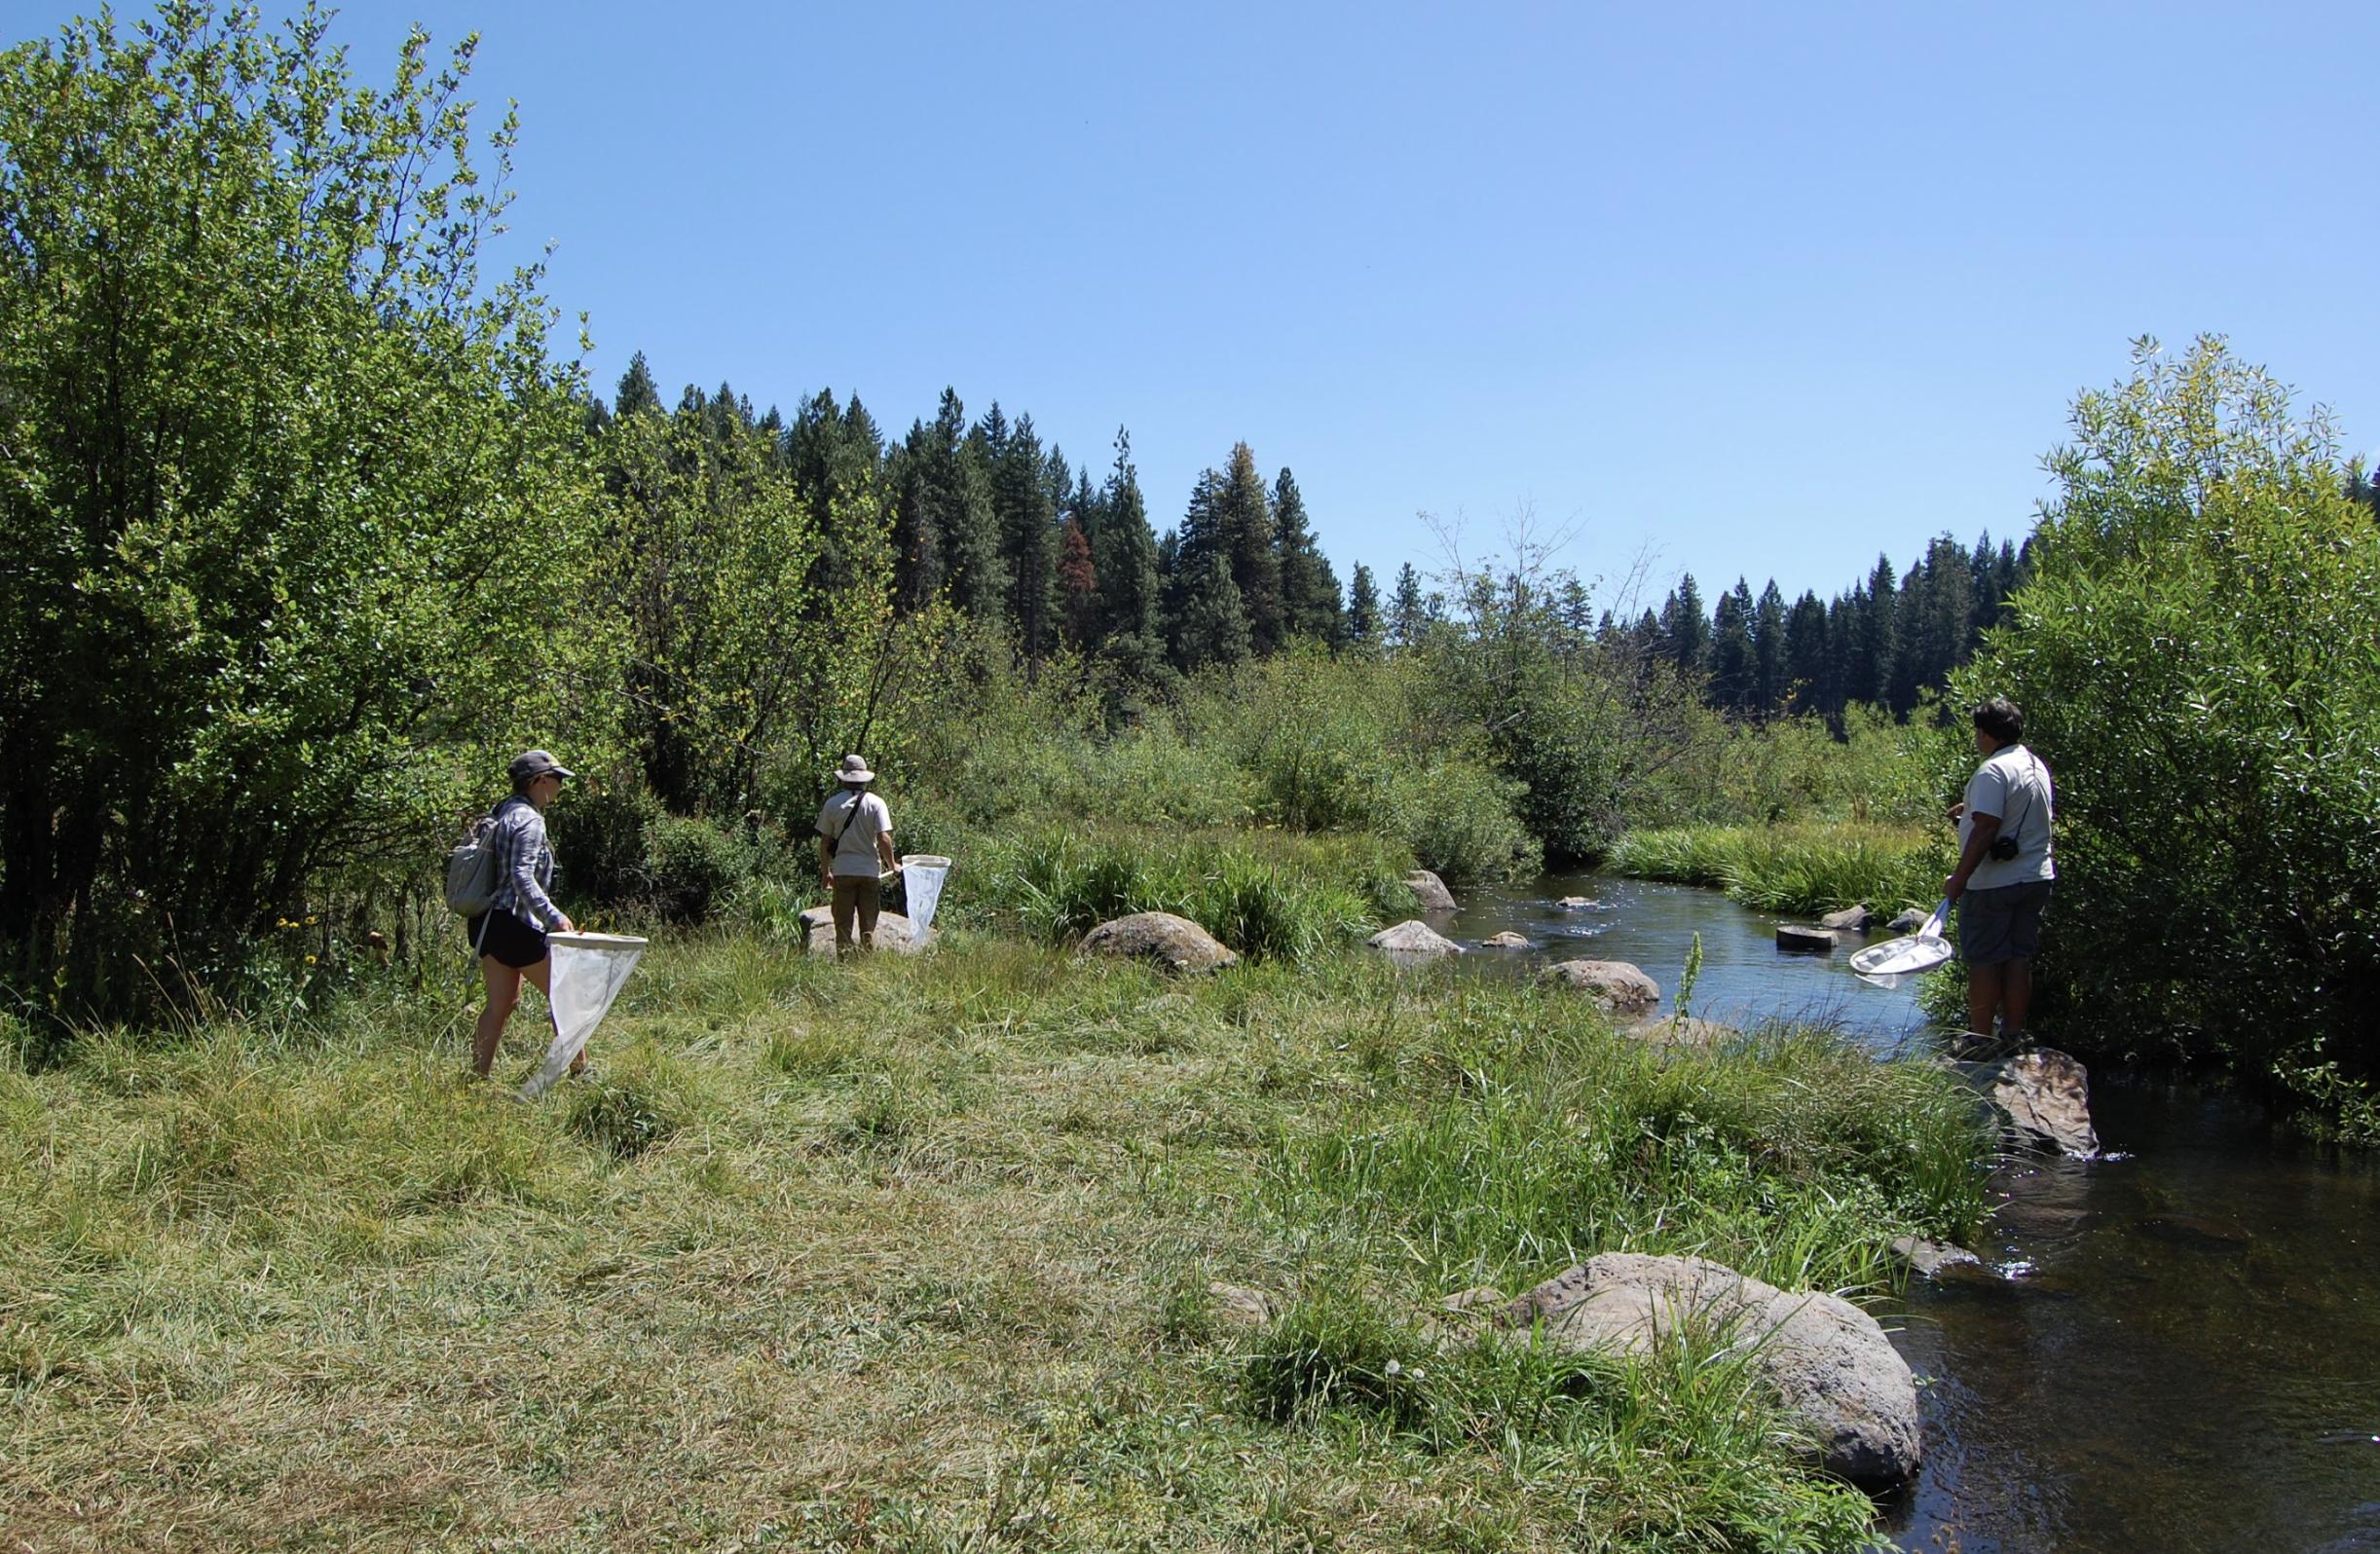 Surveying at Little Hyatt Lake. Photo by Lilia Letsch.